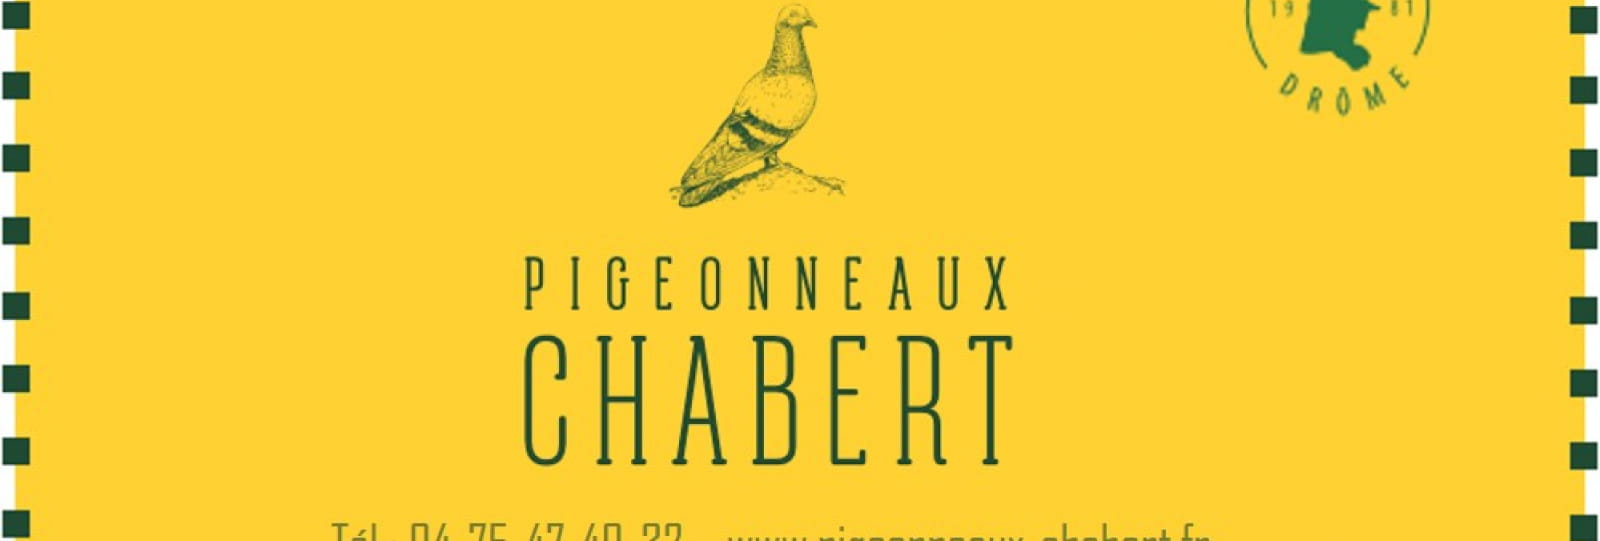 Pigeonneaux Chabert